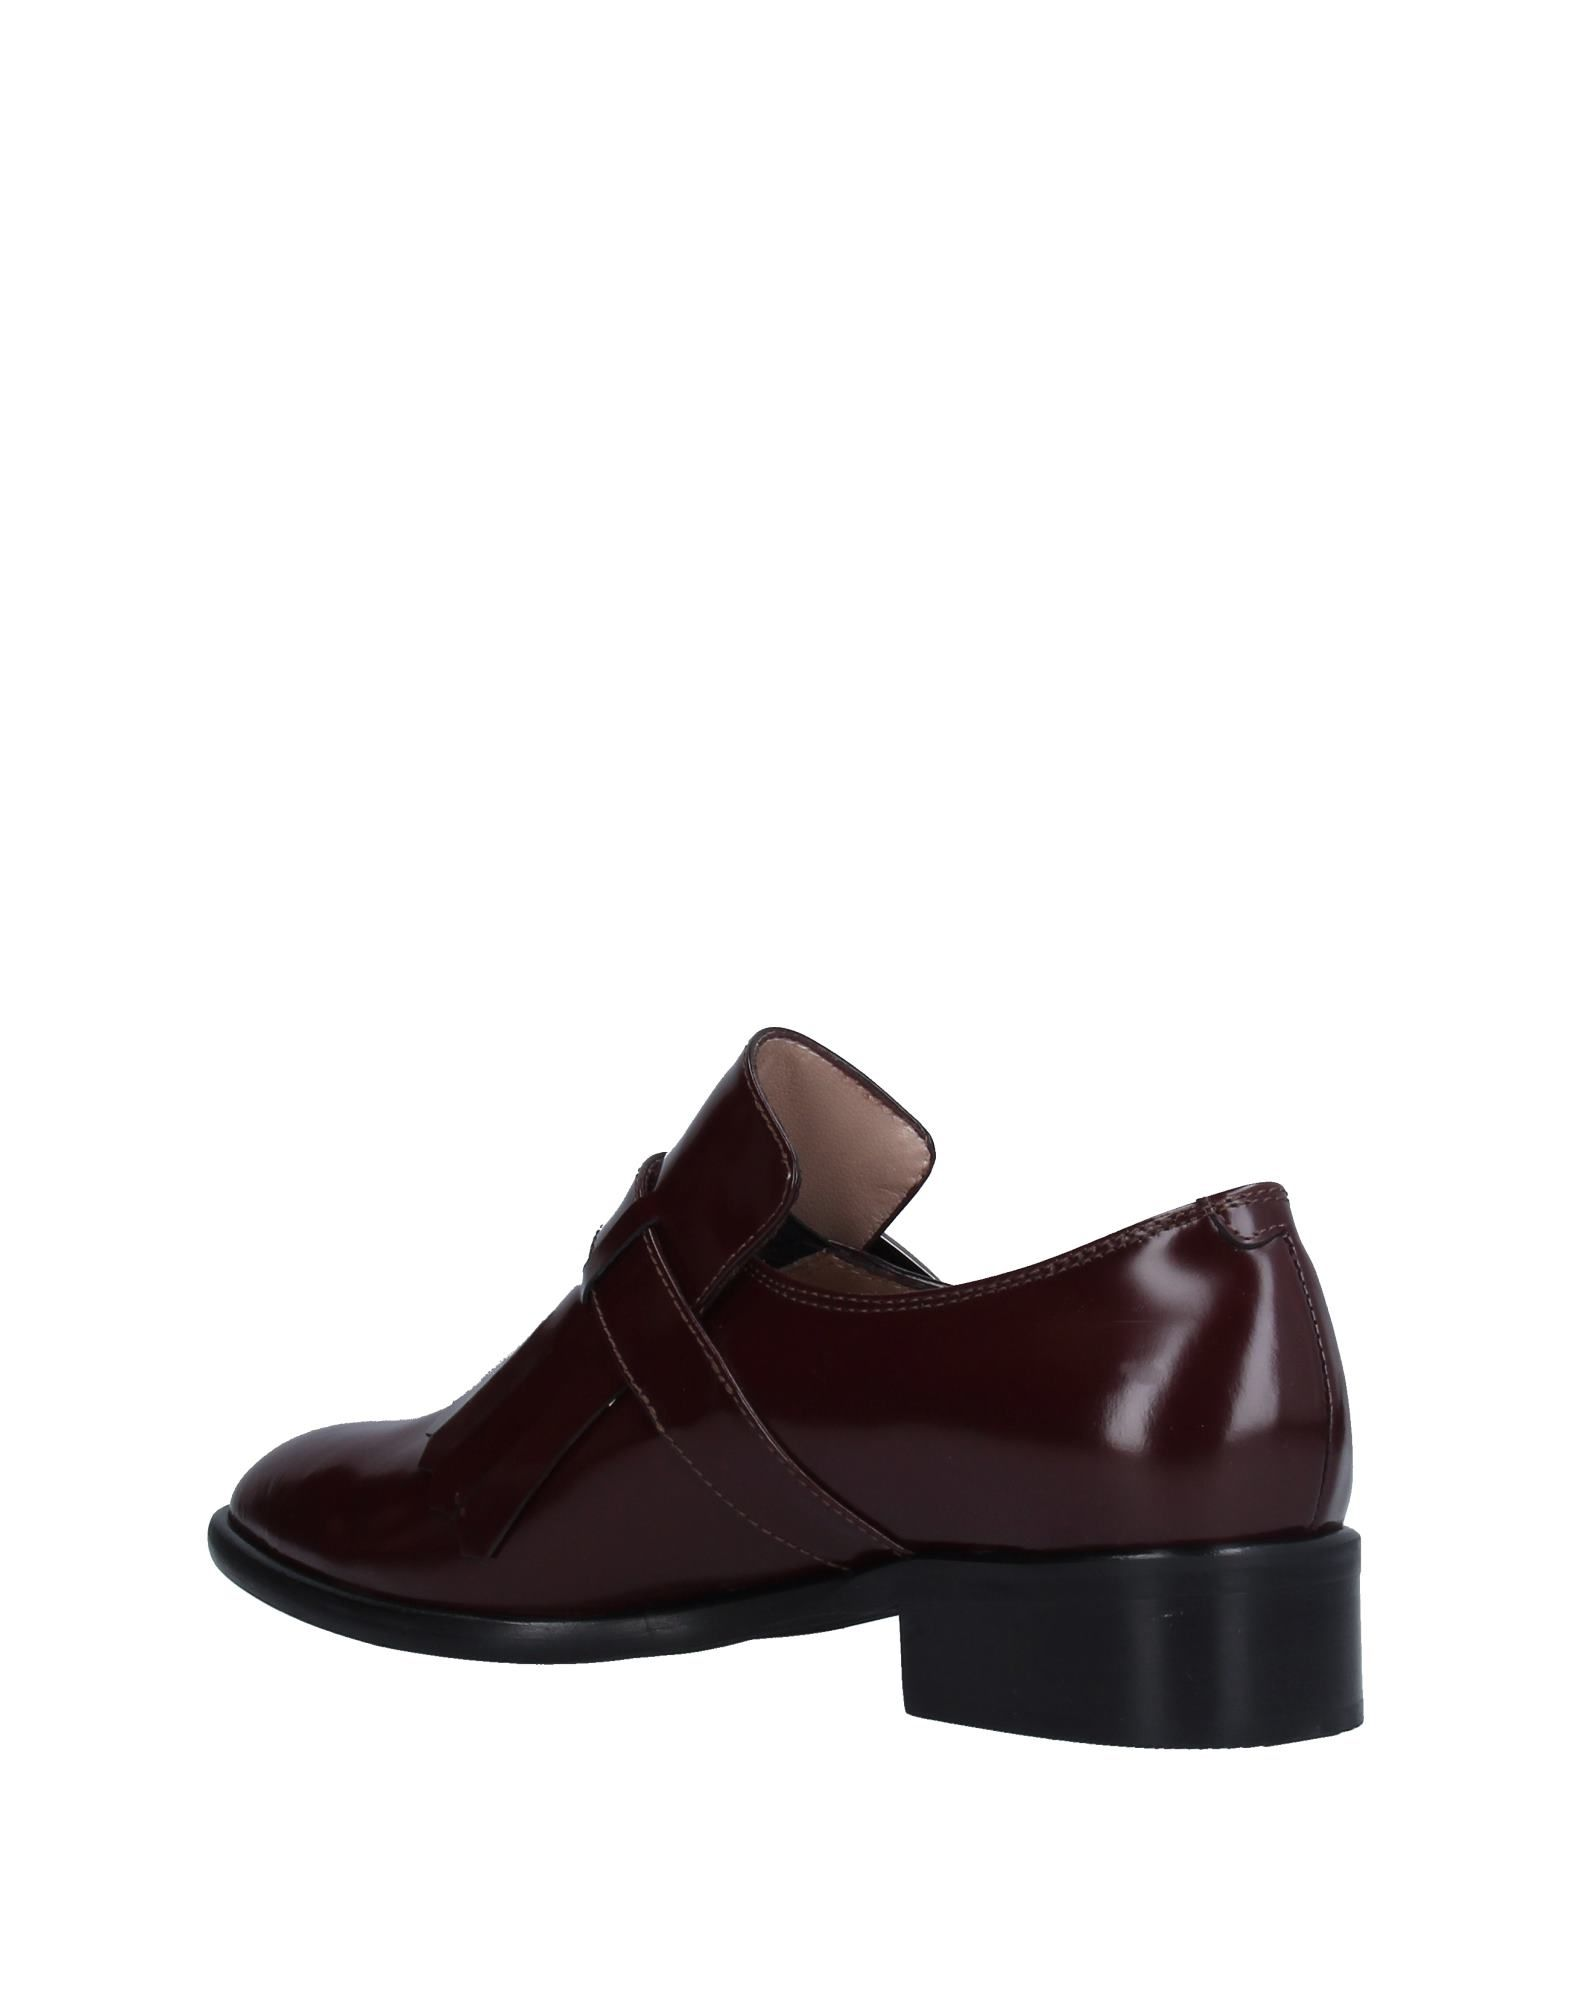 Chaussures - Mocassins Moda Di Fausto yloKd1Ggl